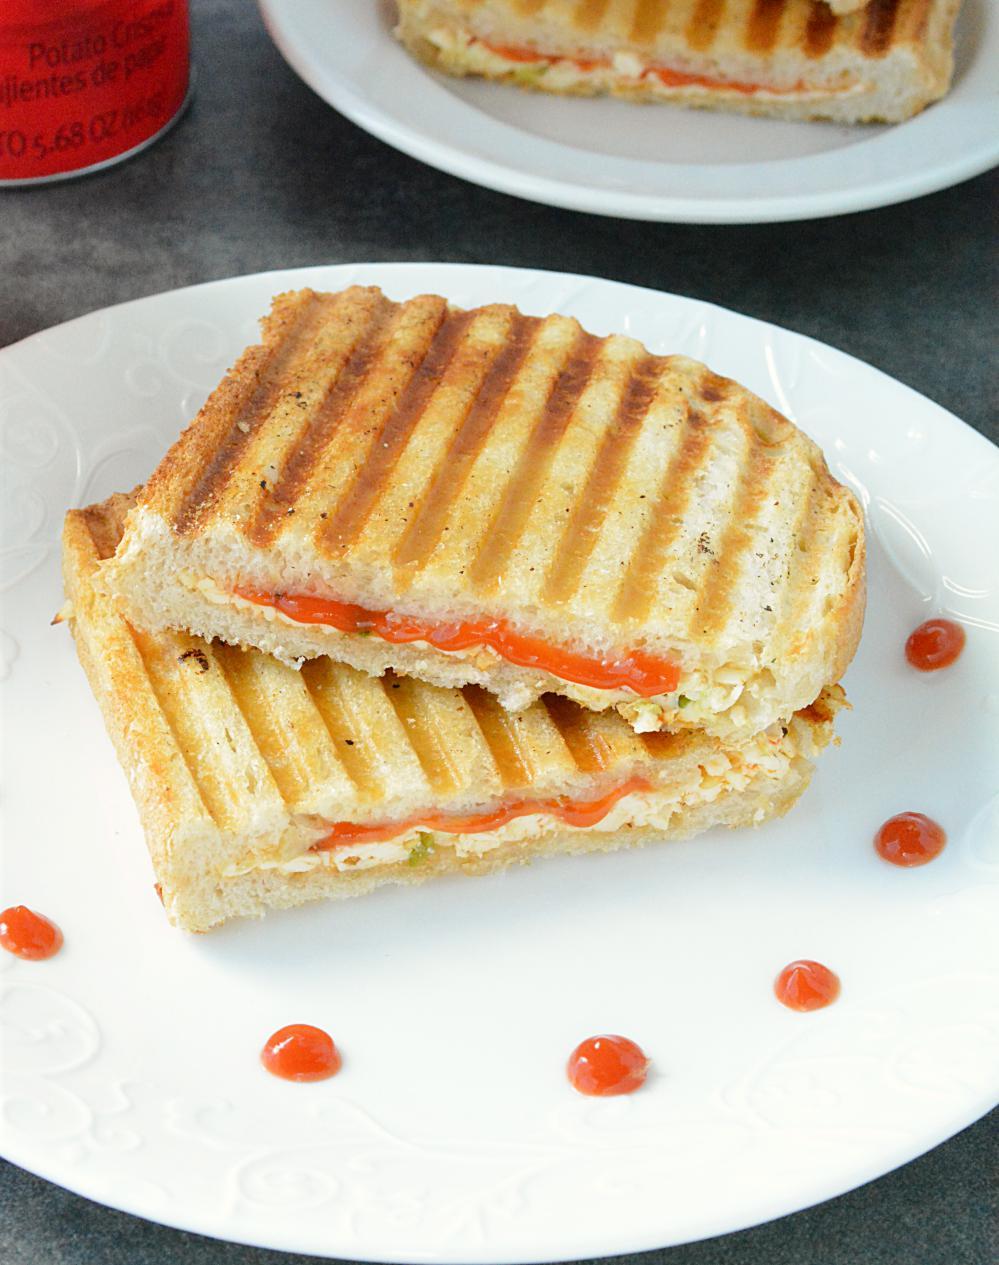 paneer-sandwich-recipe-4